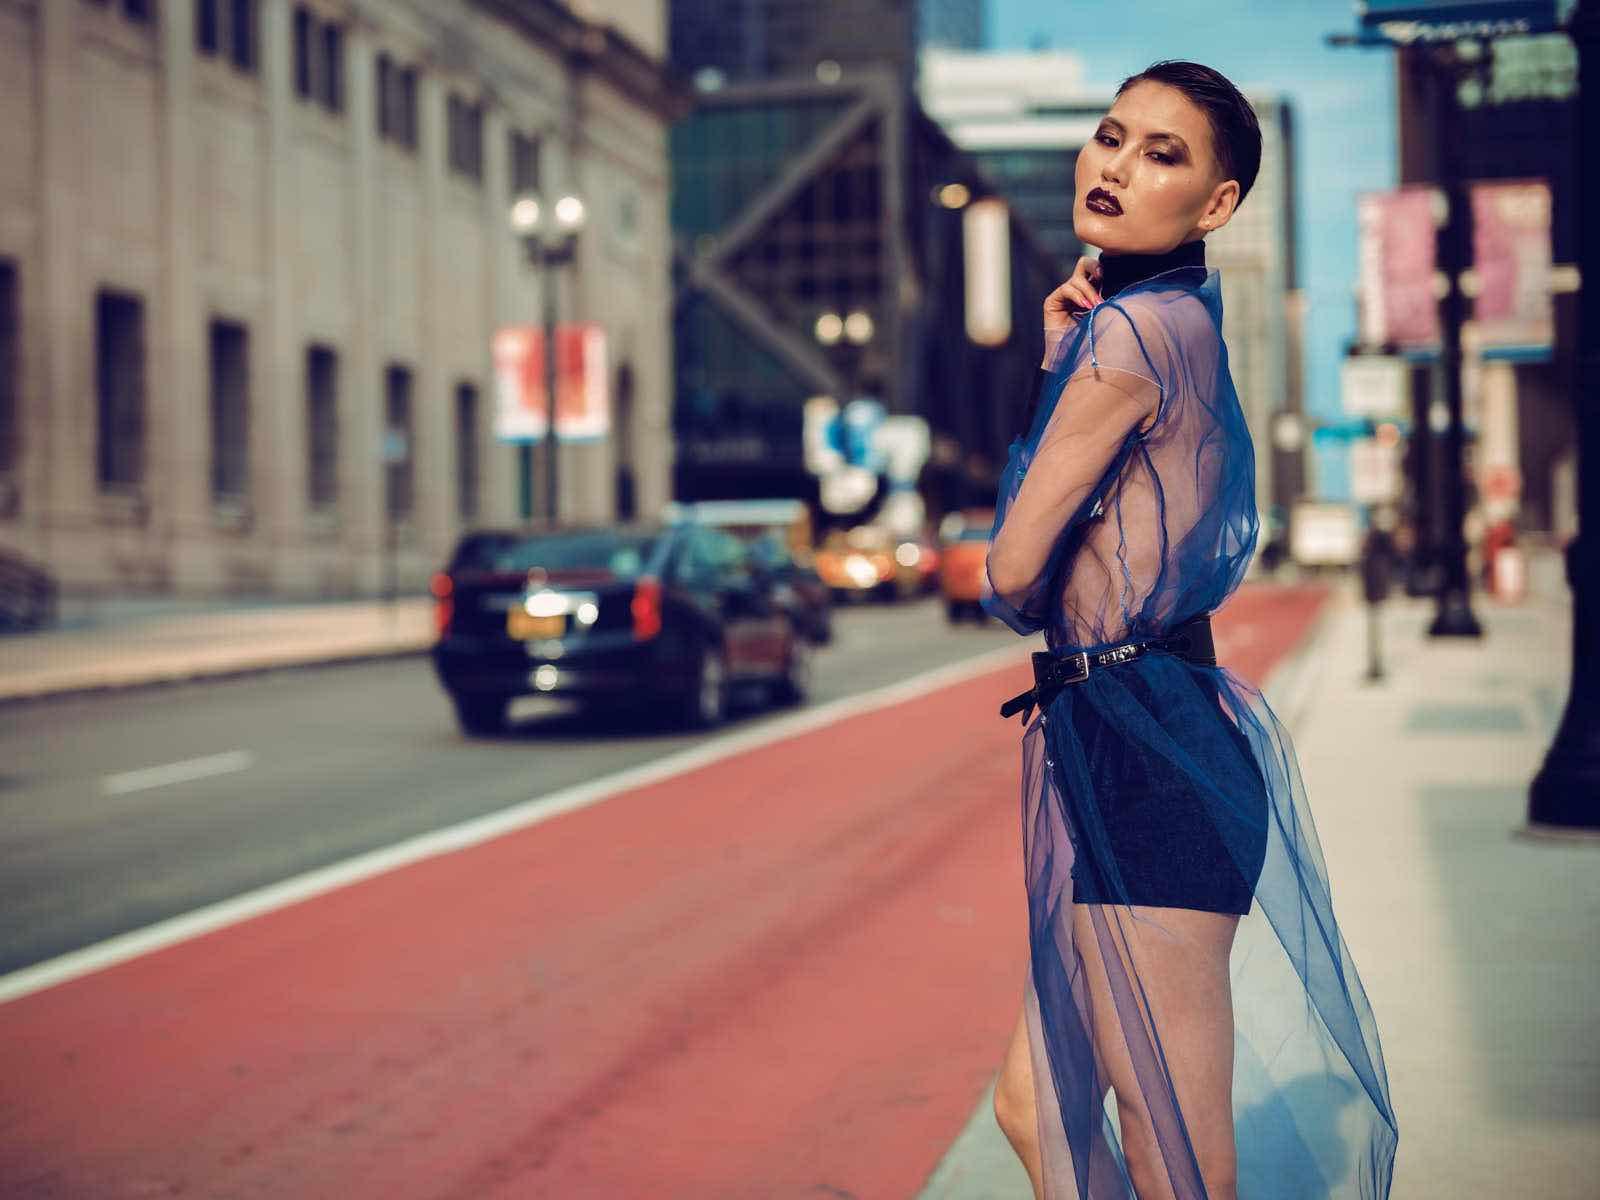 sce-agency-female-model-tia-b-9aa